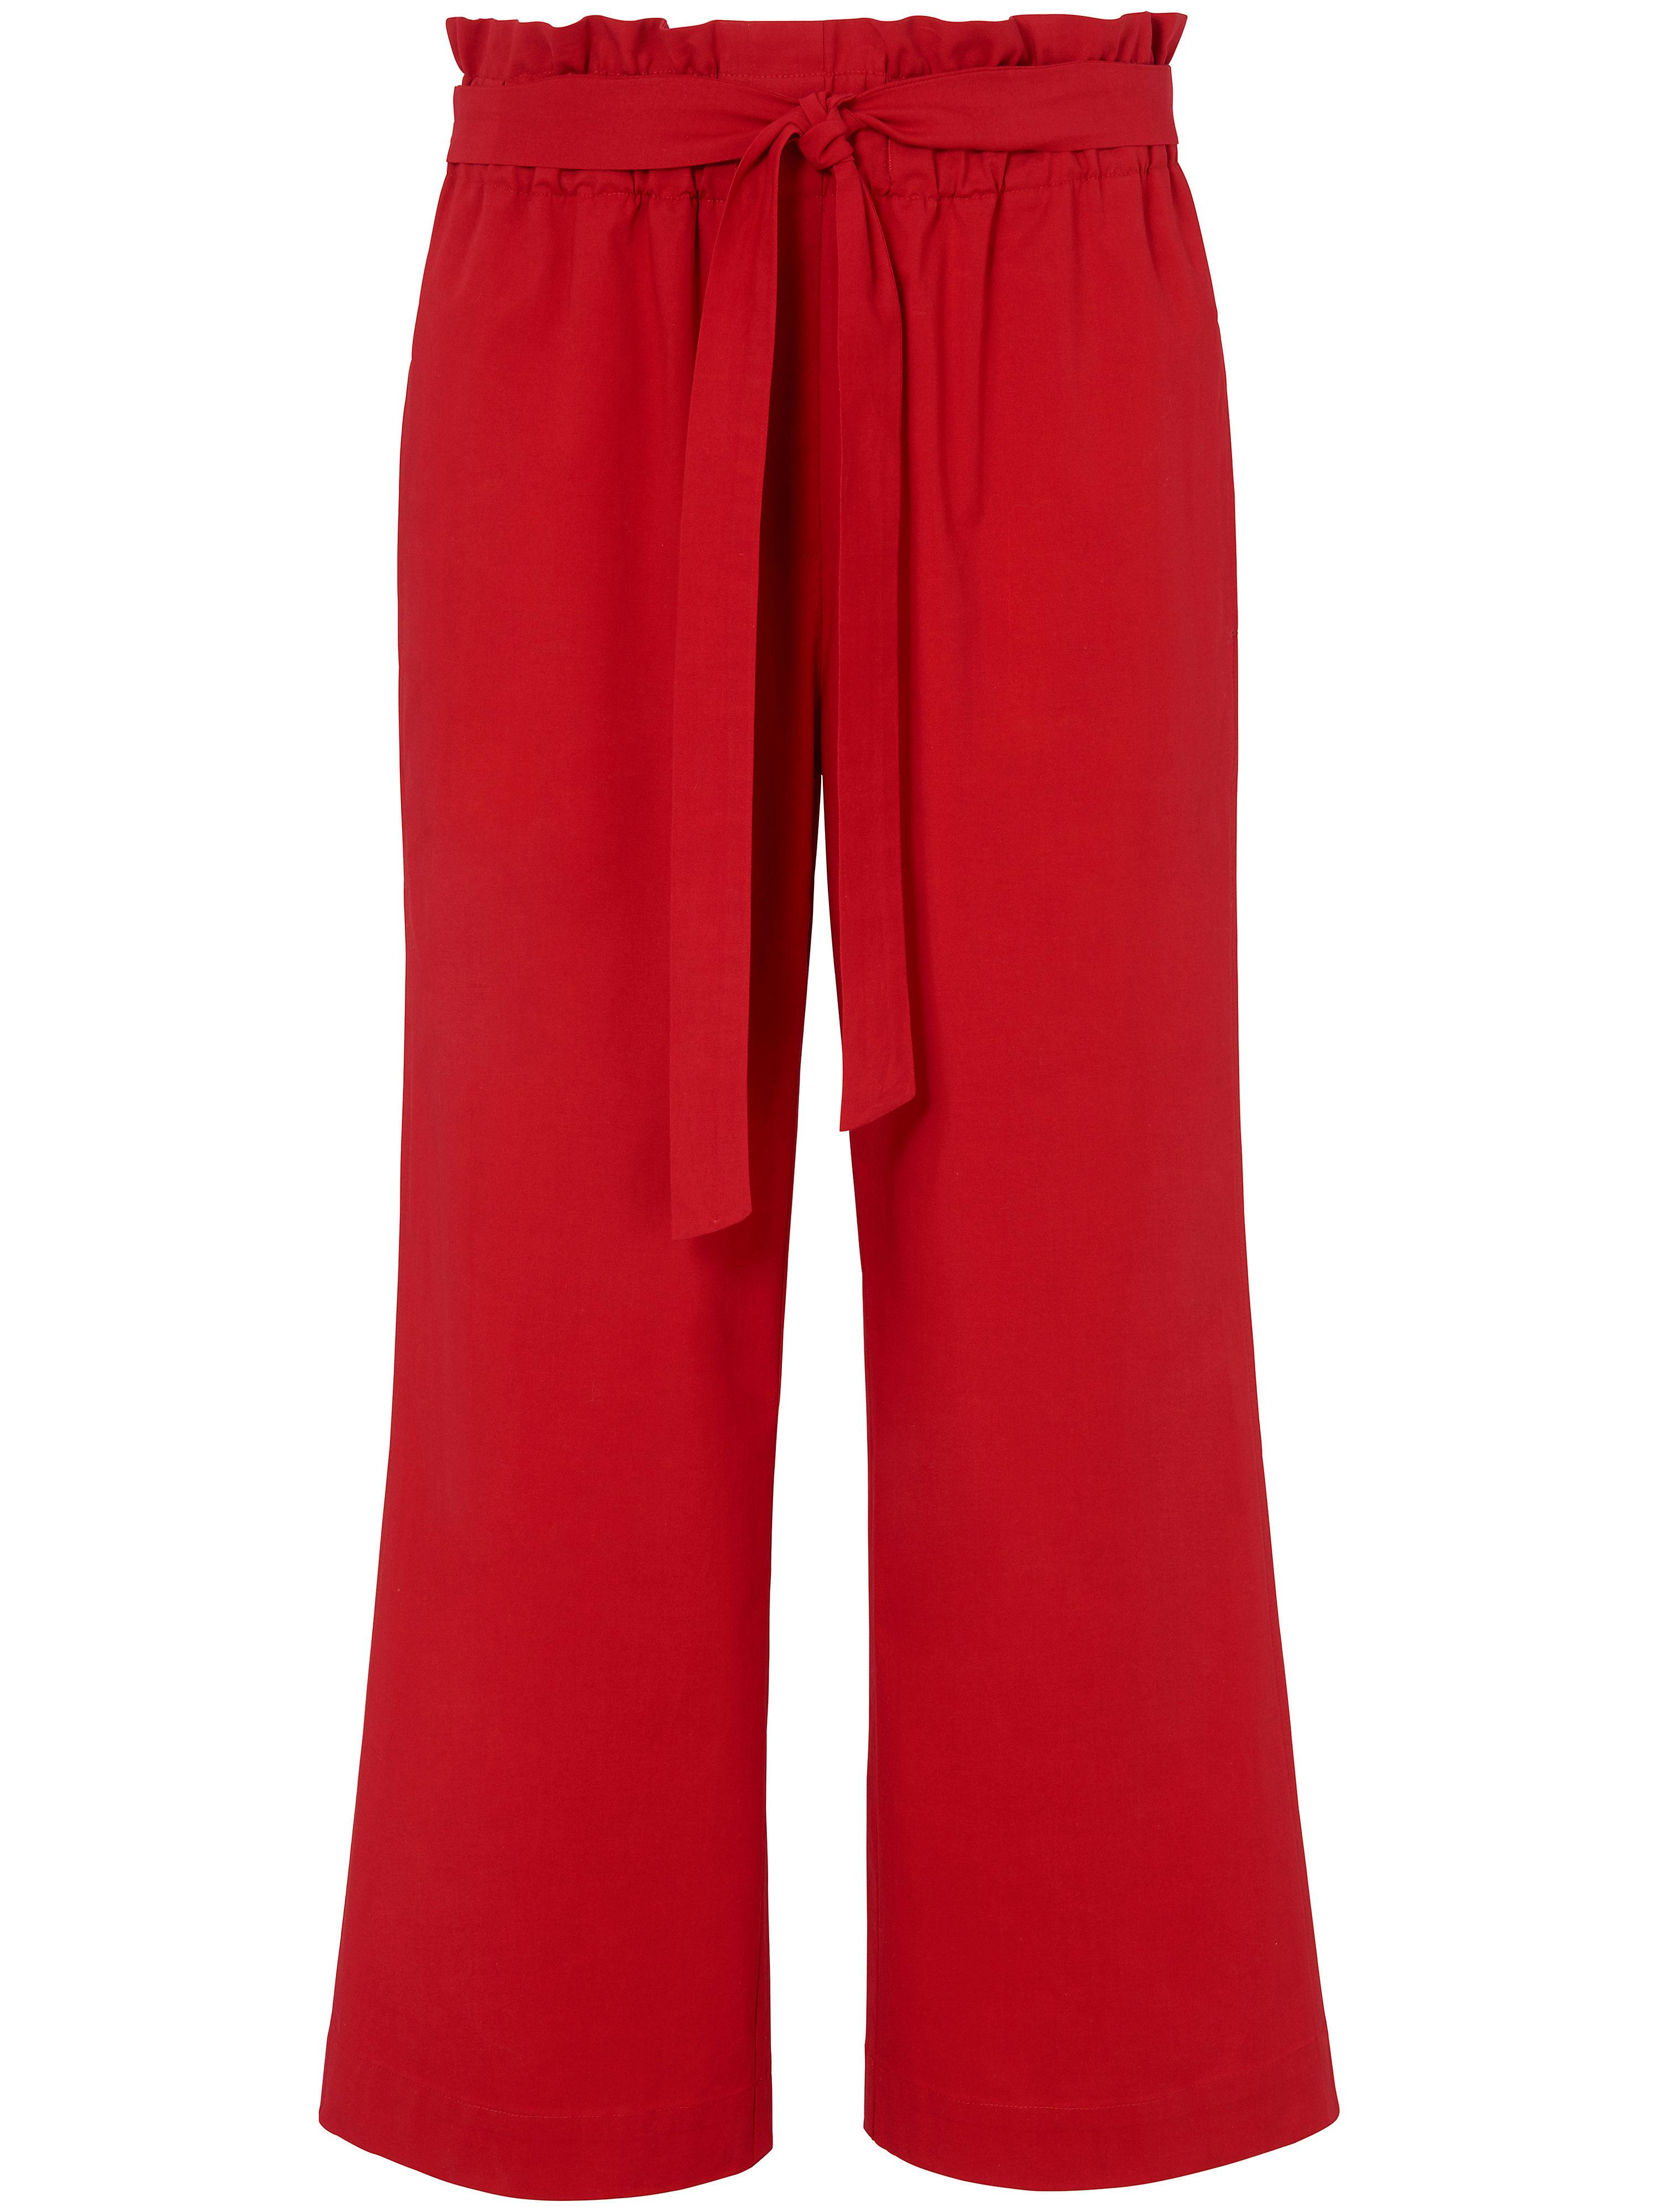 Le pantalon 7/8  MYBC rouge taille 44